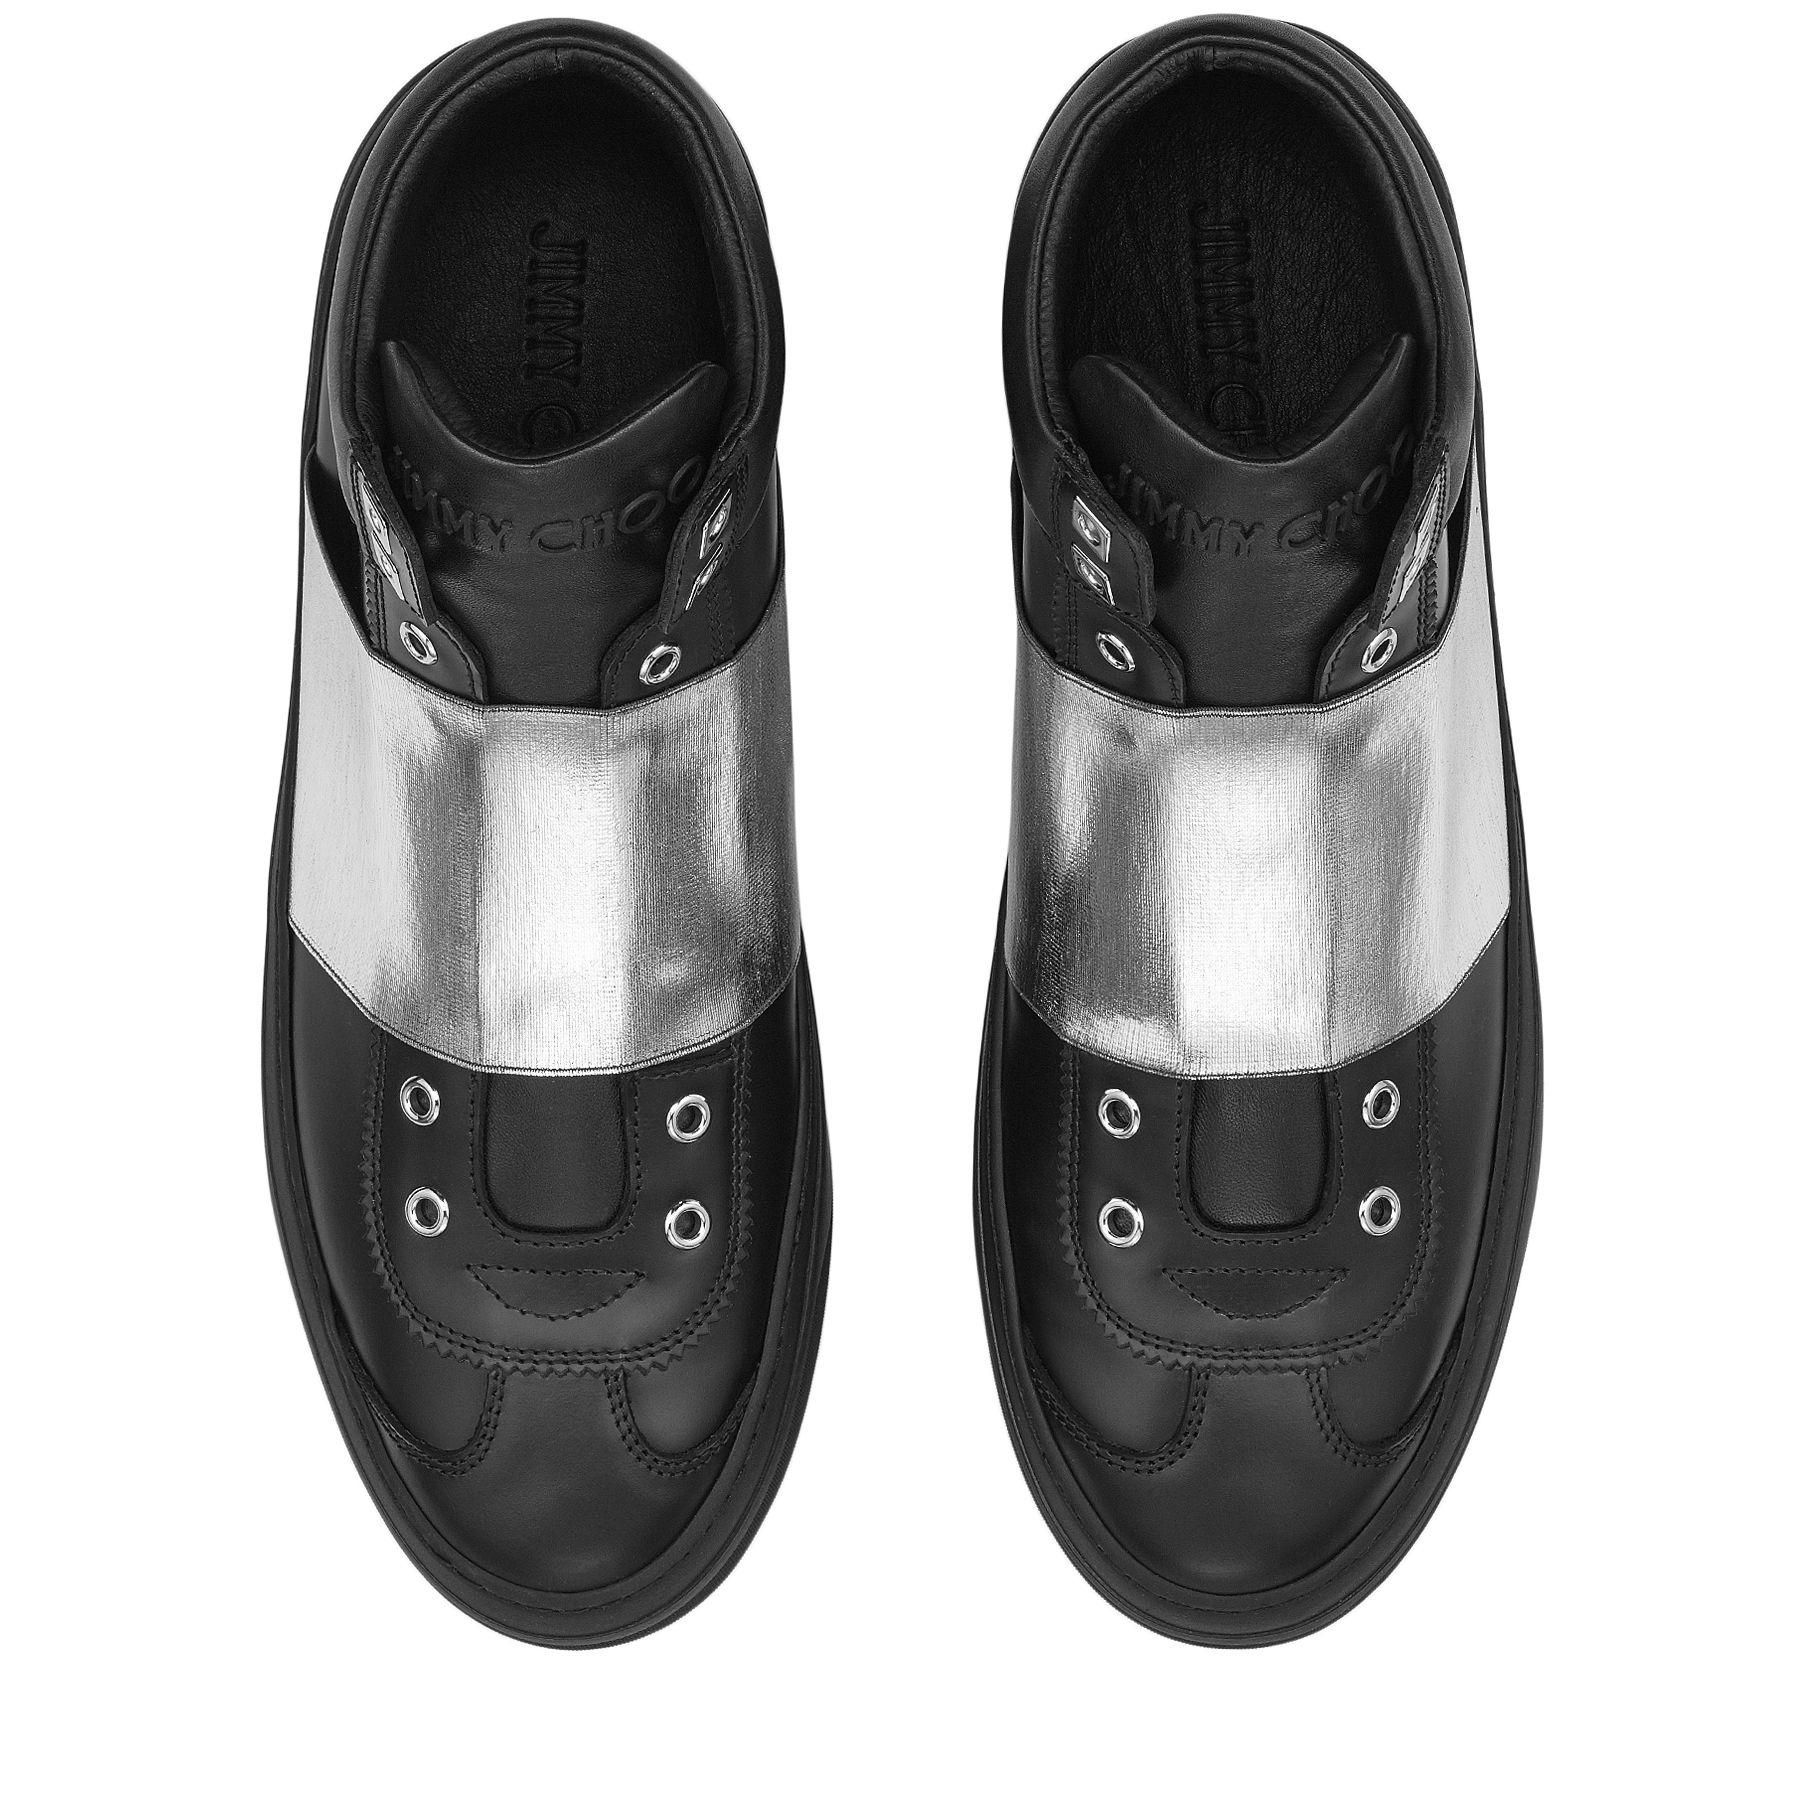 Matt Paint For Leather Shoes